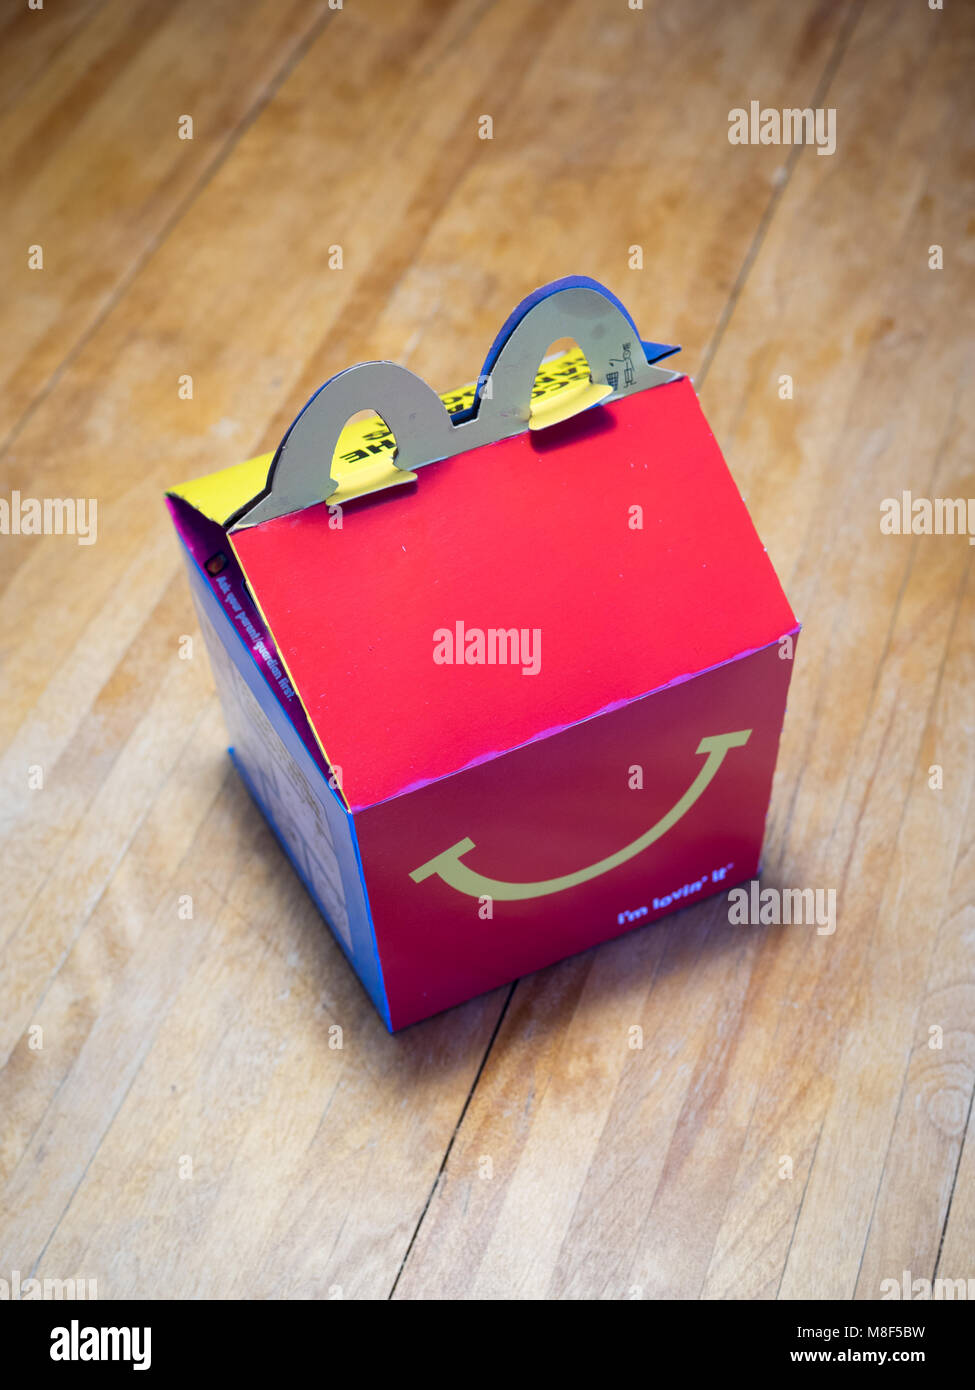 A McDonald's Happy Meal box. - Stock Image